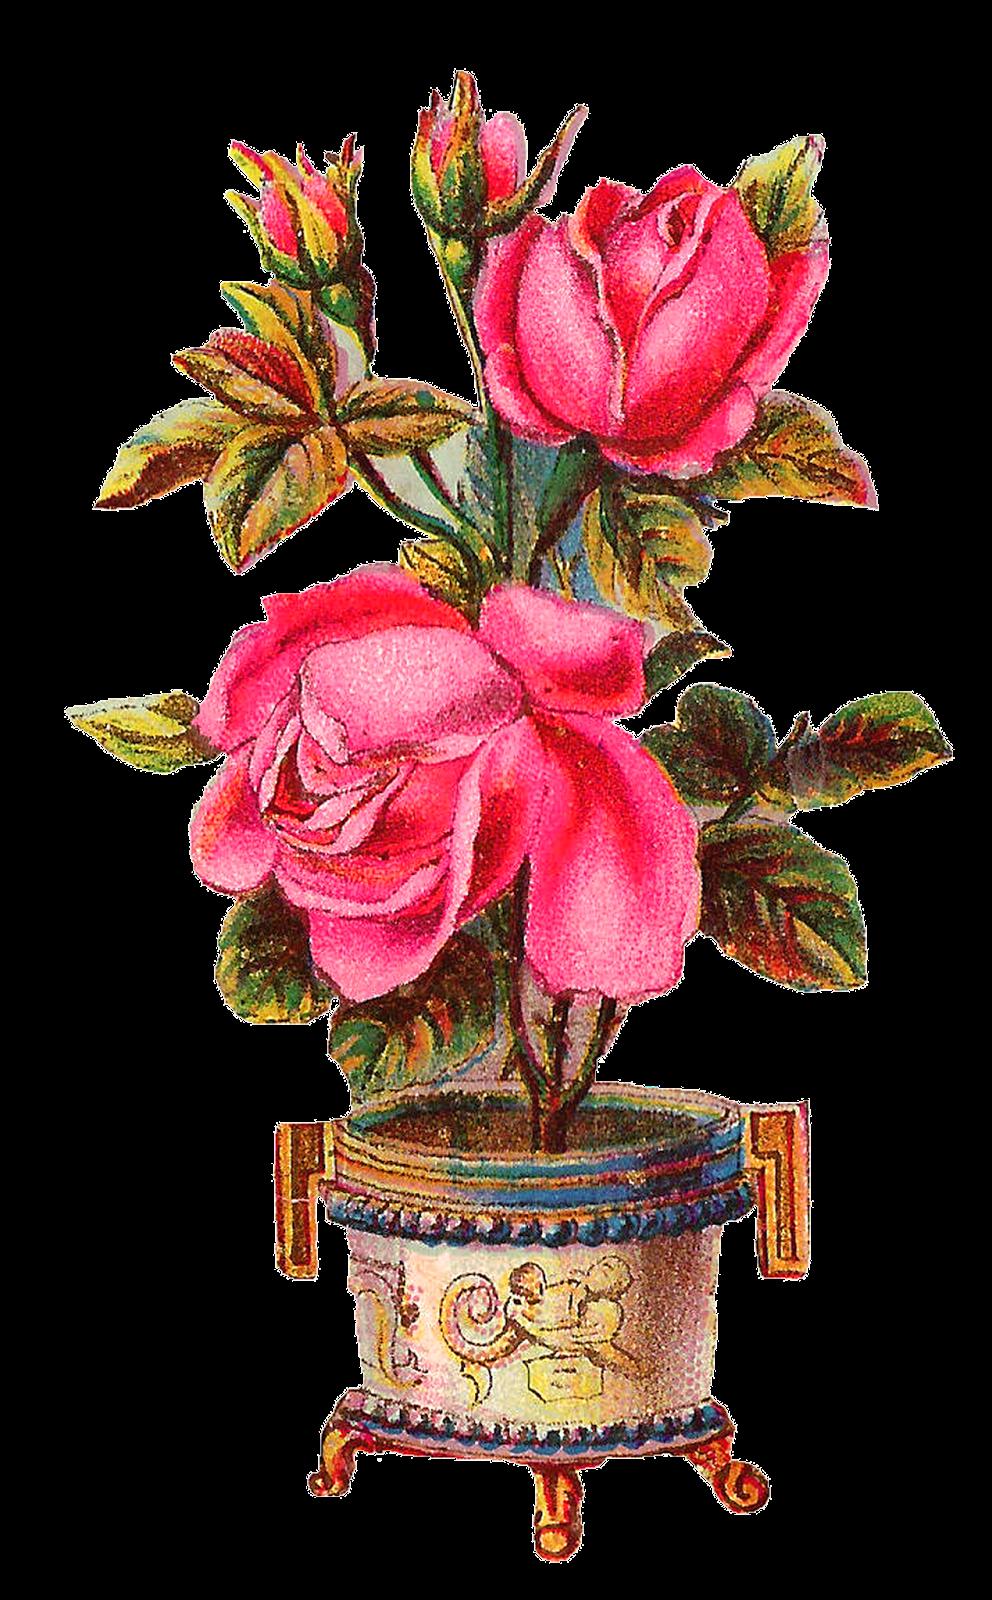 Antique images digital scrapbooking. Clipart roses vase